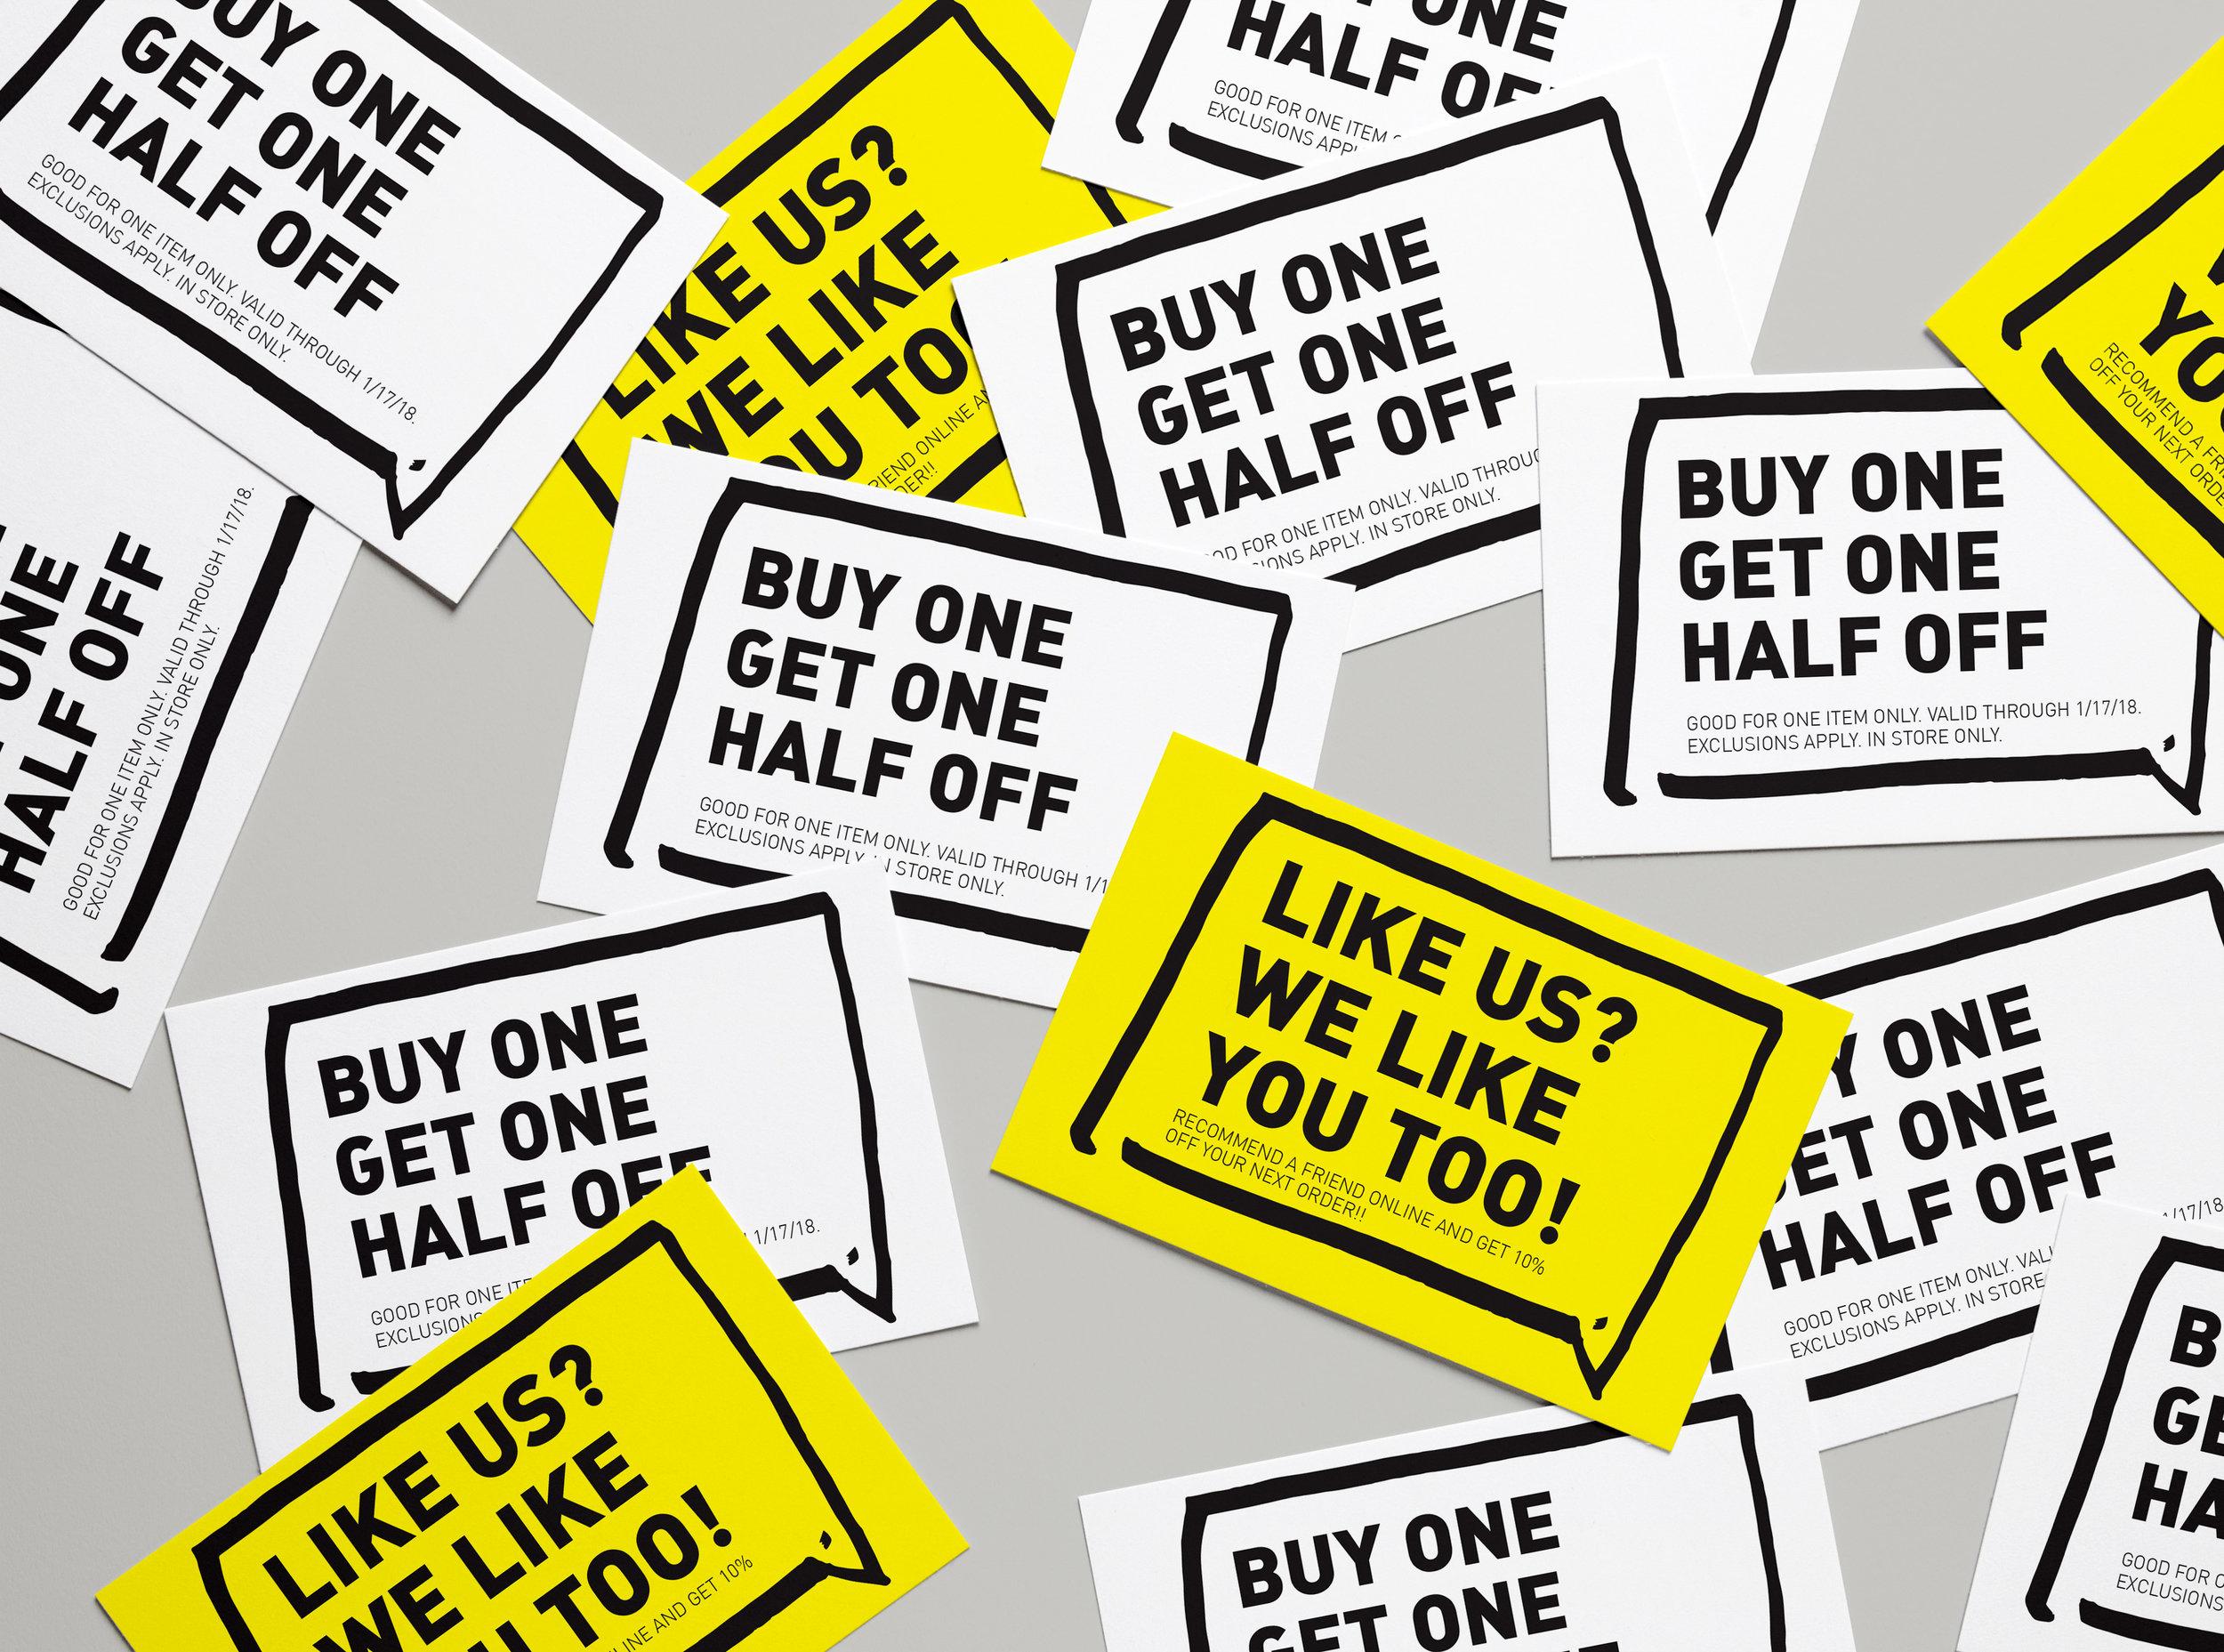 REBOOT_coupons.jpg